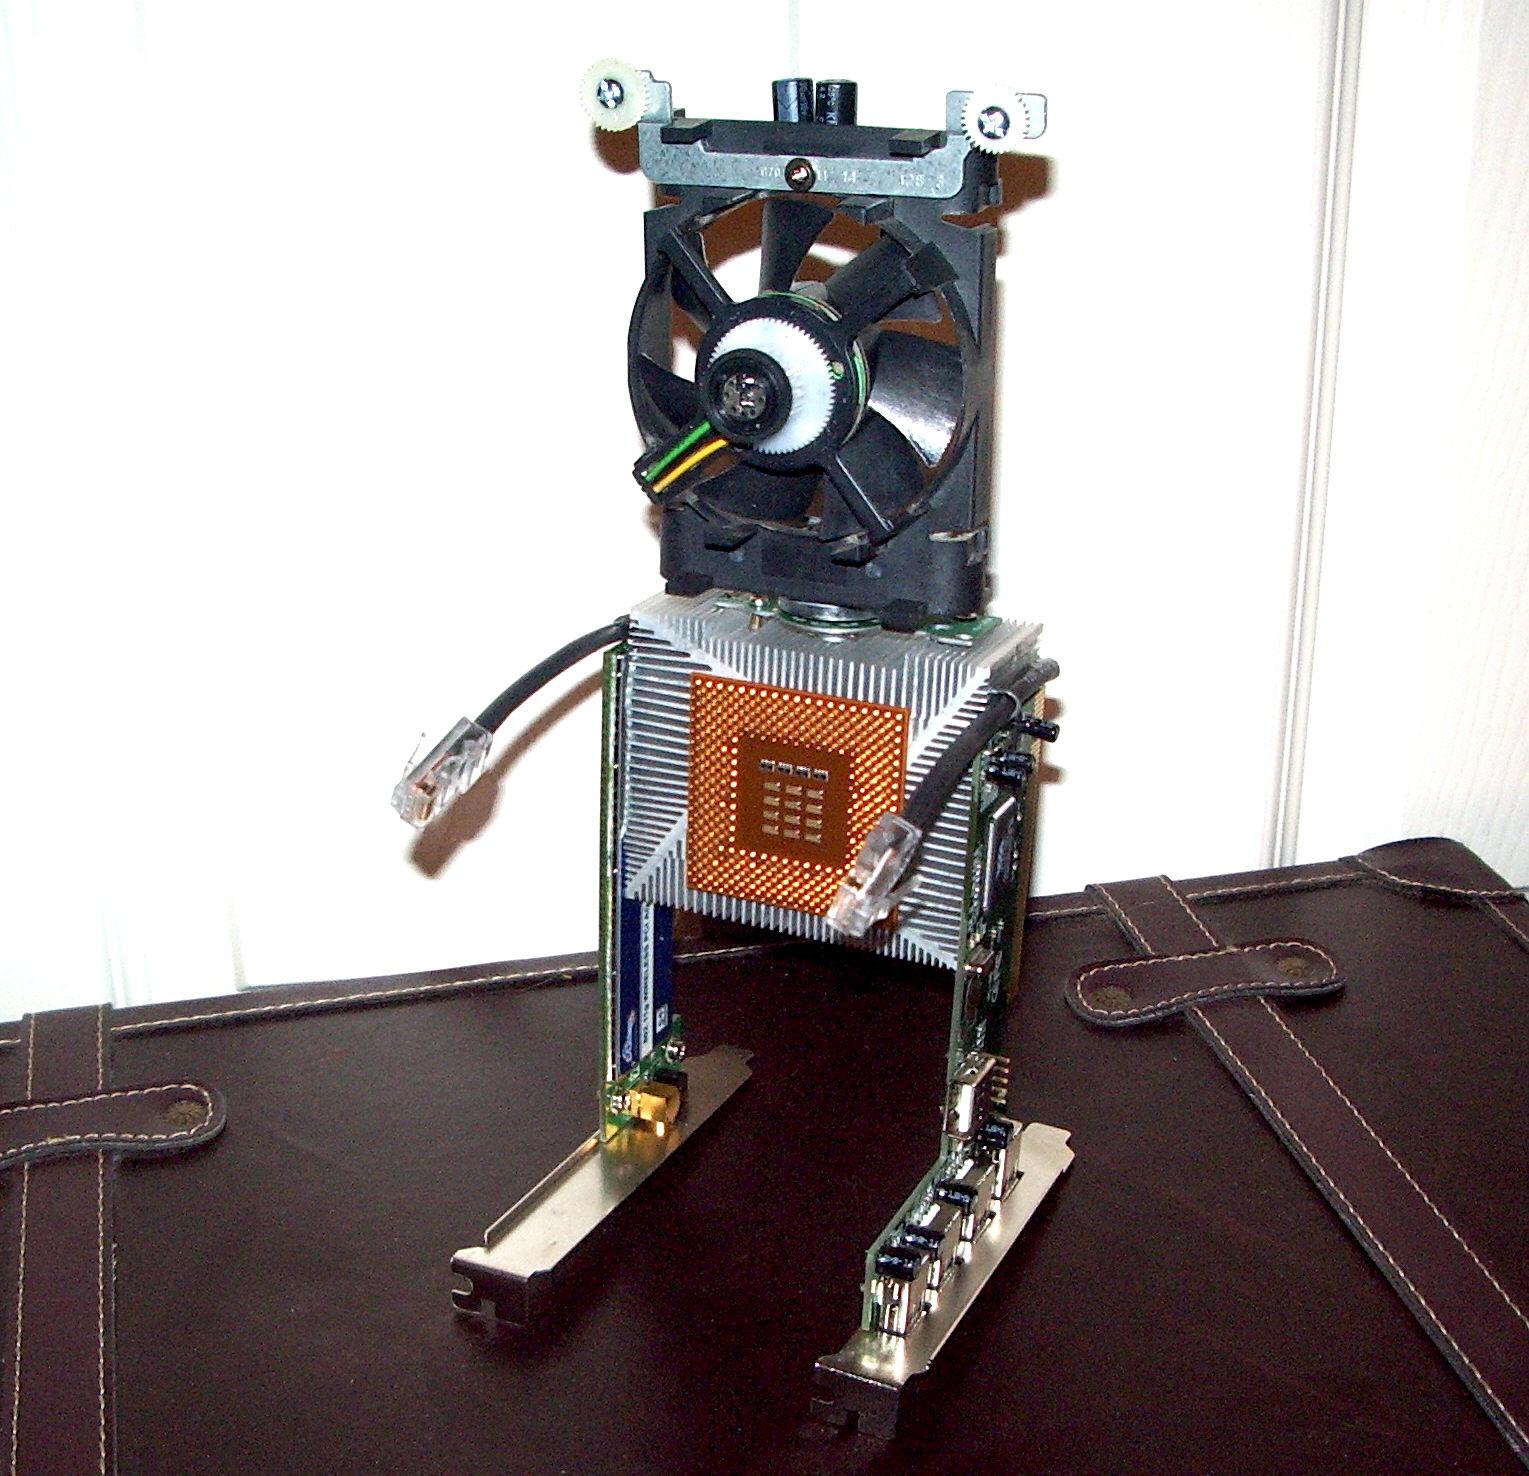 Repurposing an old computer